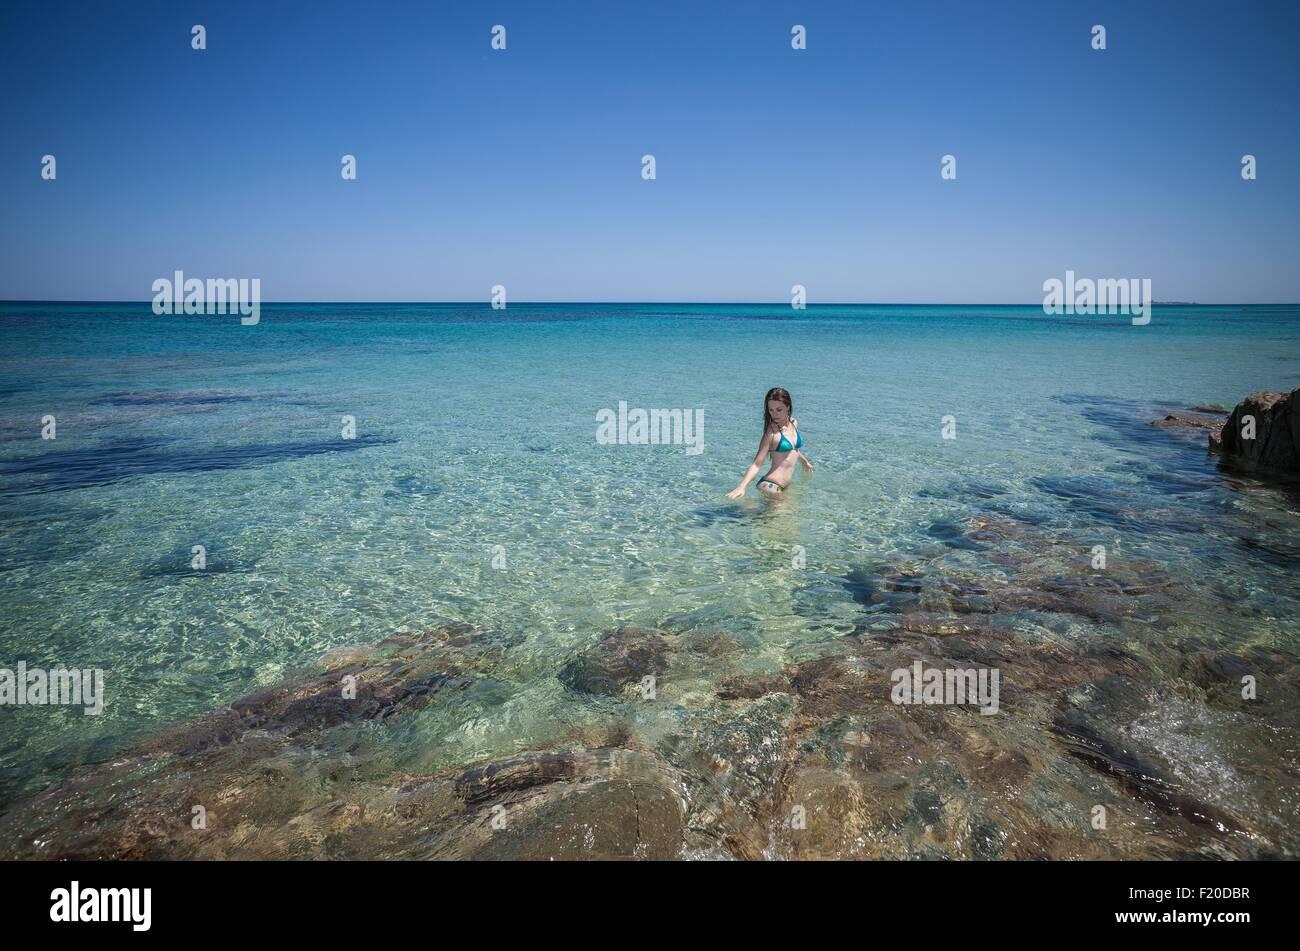 Young woman wearing bikini de patauger dans la mer, Cagliari, Sardaigne, Italie Photo Stock